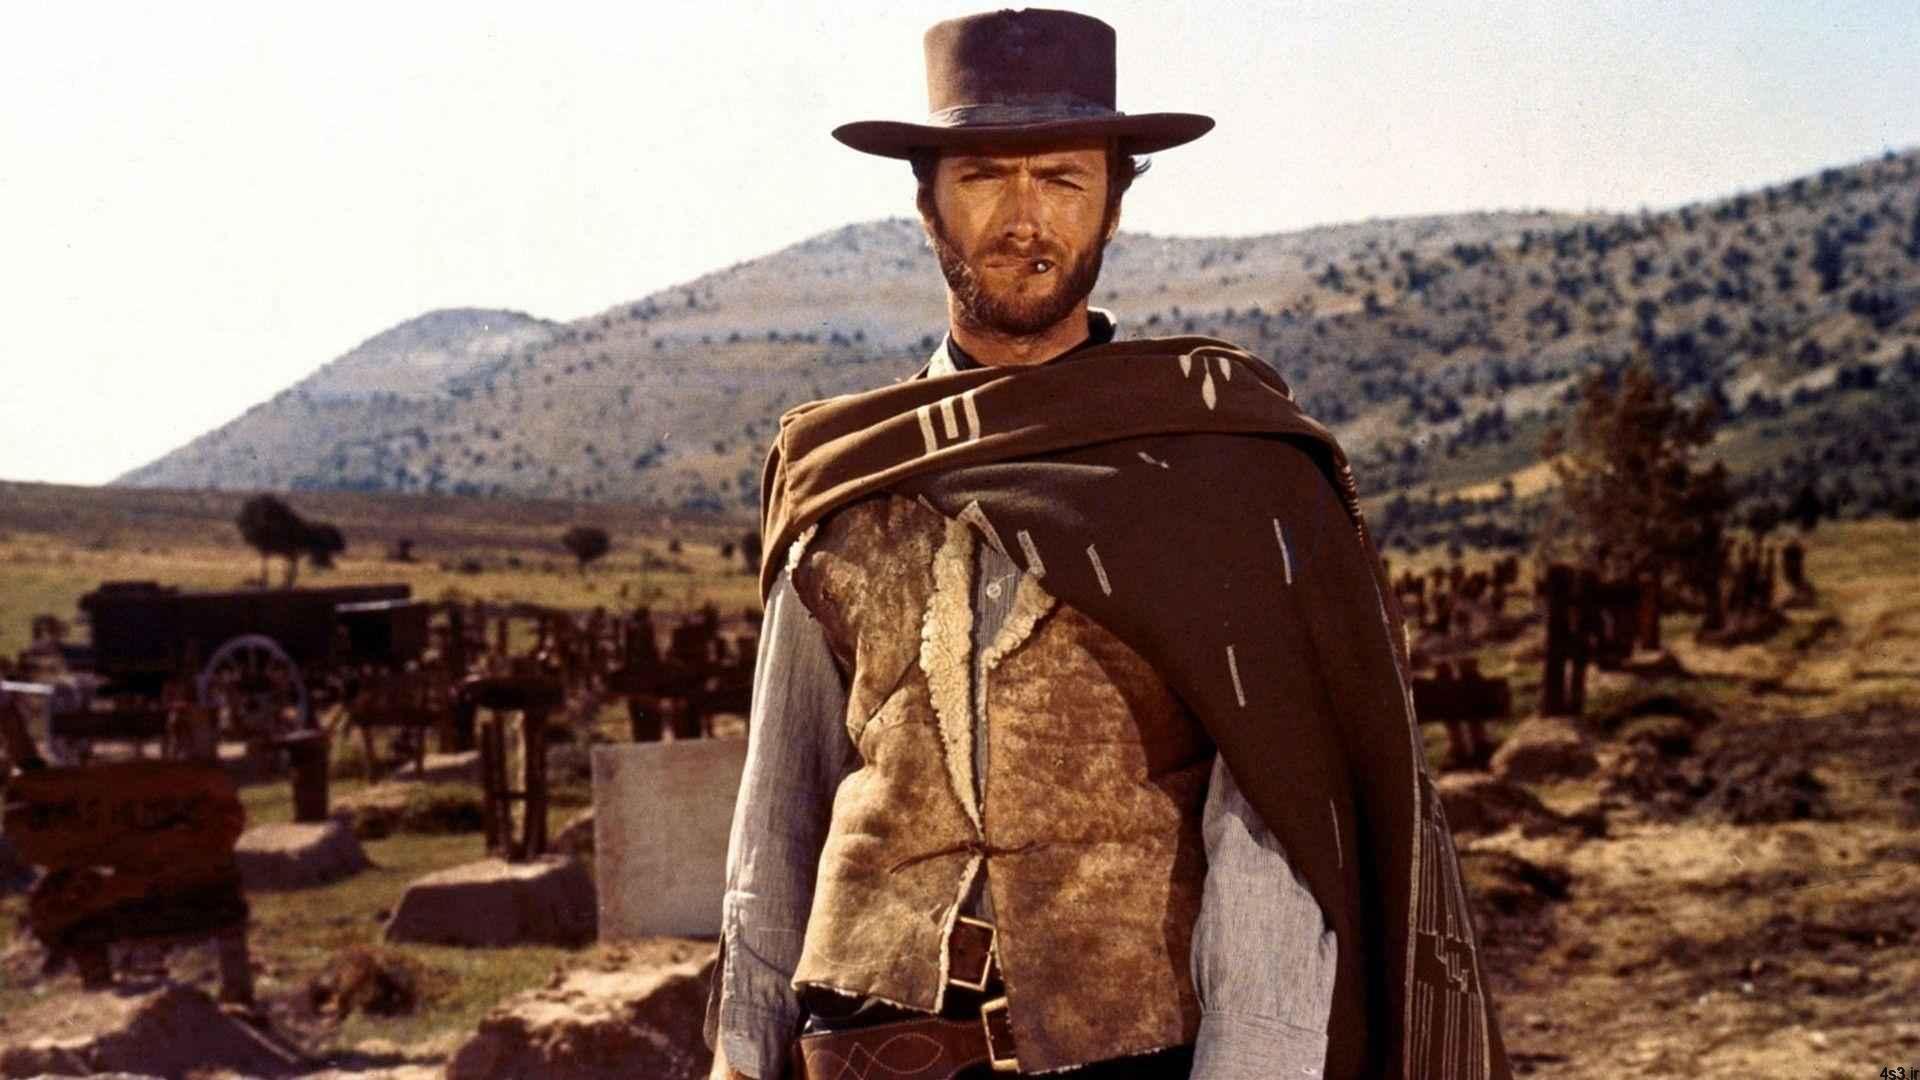 Clint Eastwood Wallpapers Part 1 | تصاویر کلینت ایستوود بخش ۱